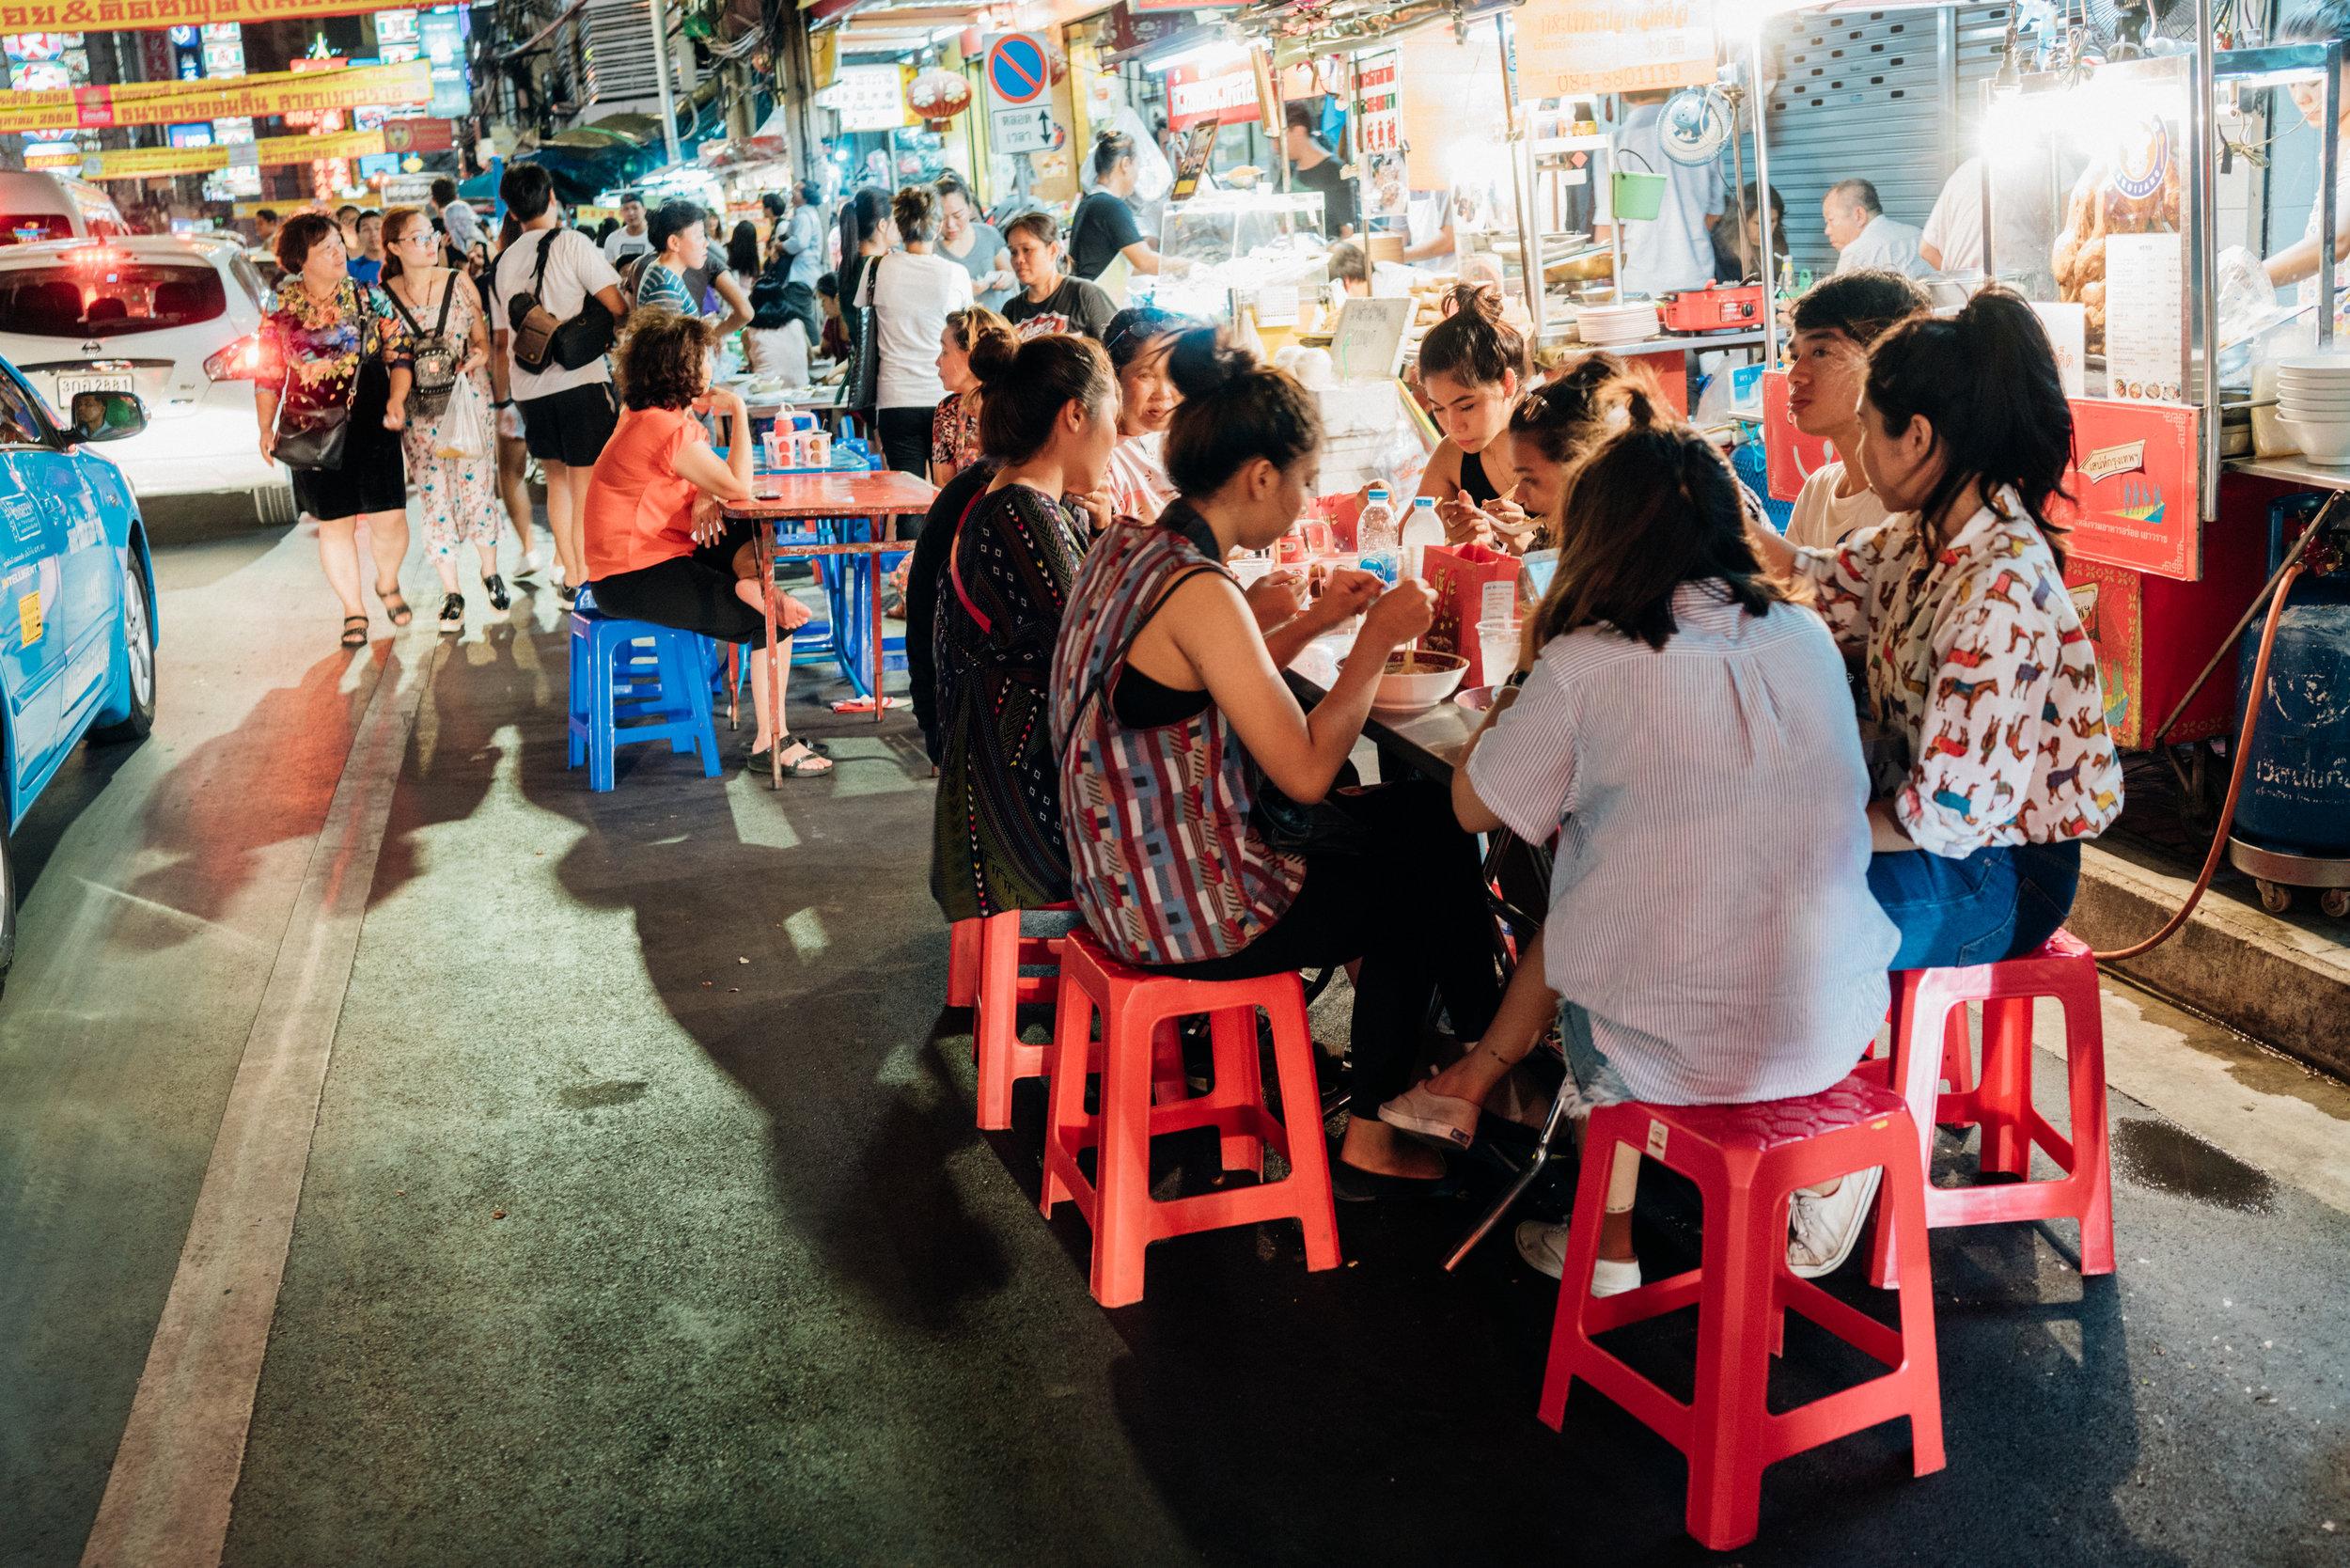 Bangkok's Chinatown is full of street food vendors come sundown